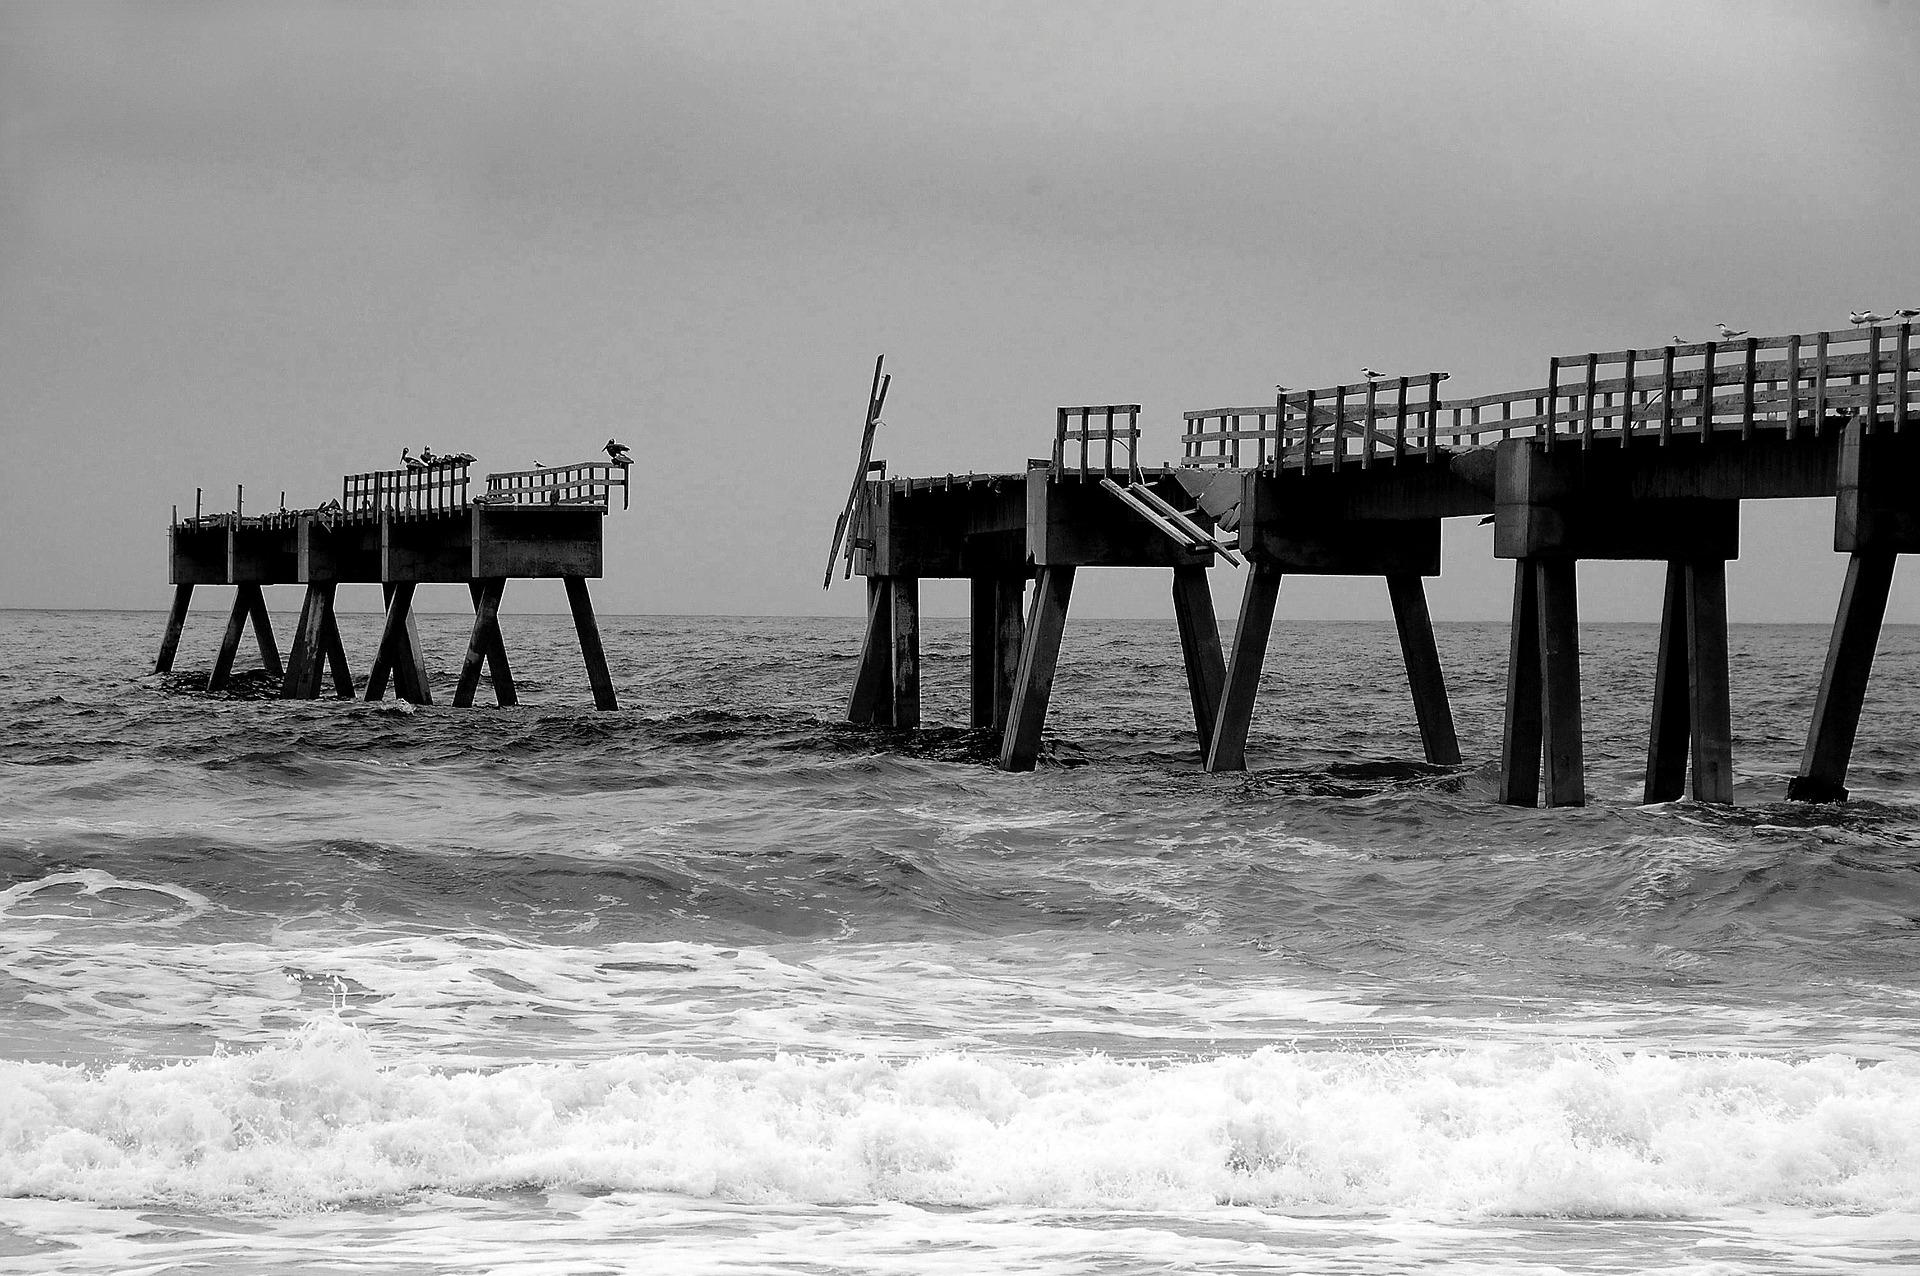 Kaputte Brücke im Meer